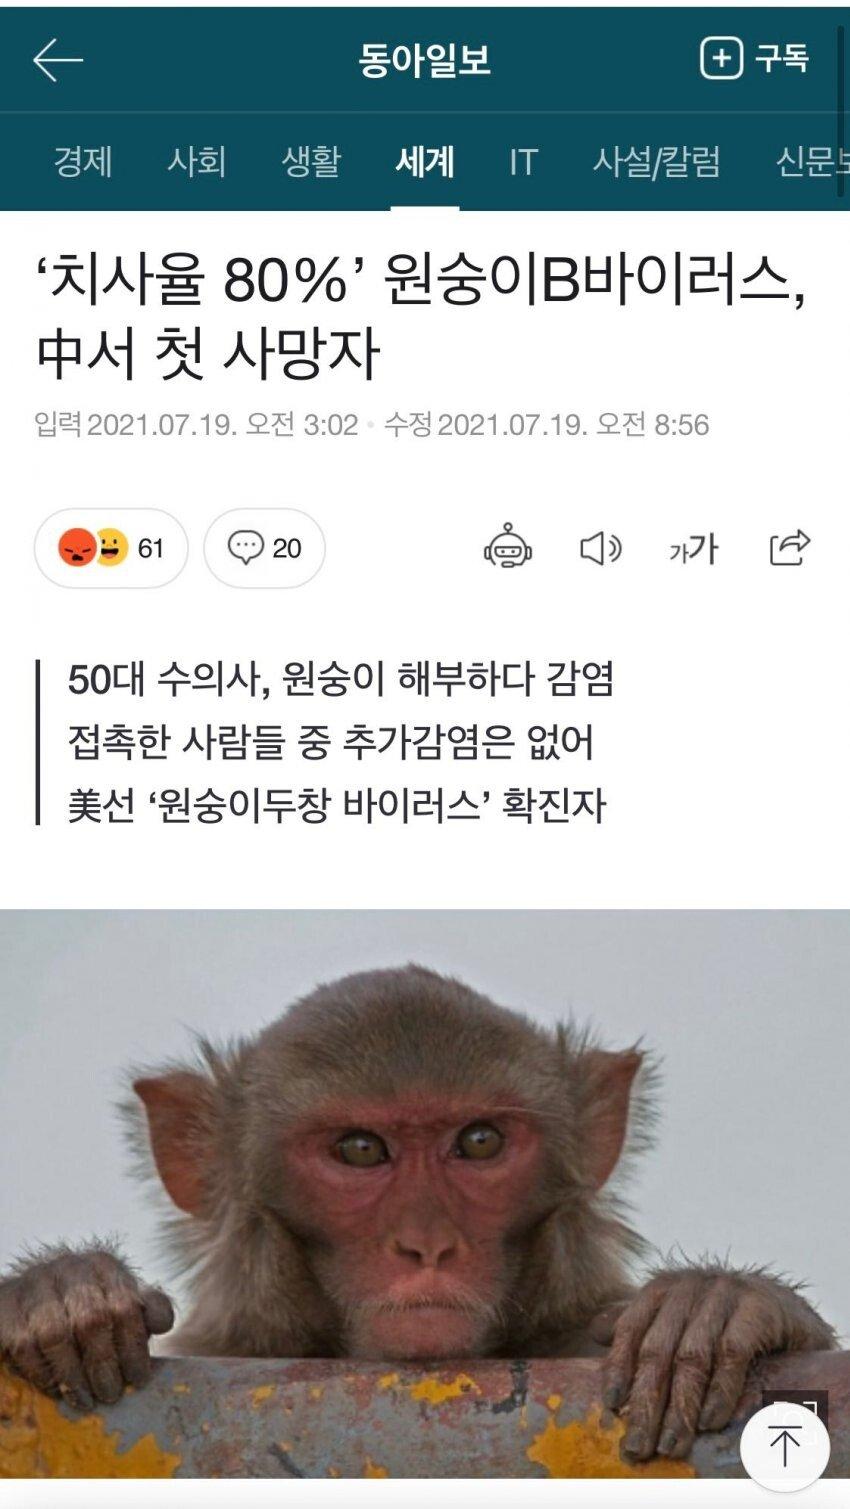 6aeff1b71f61d96b8913f9196d71077e.jpg 참깨국에서 원숭이 바이러스 발생